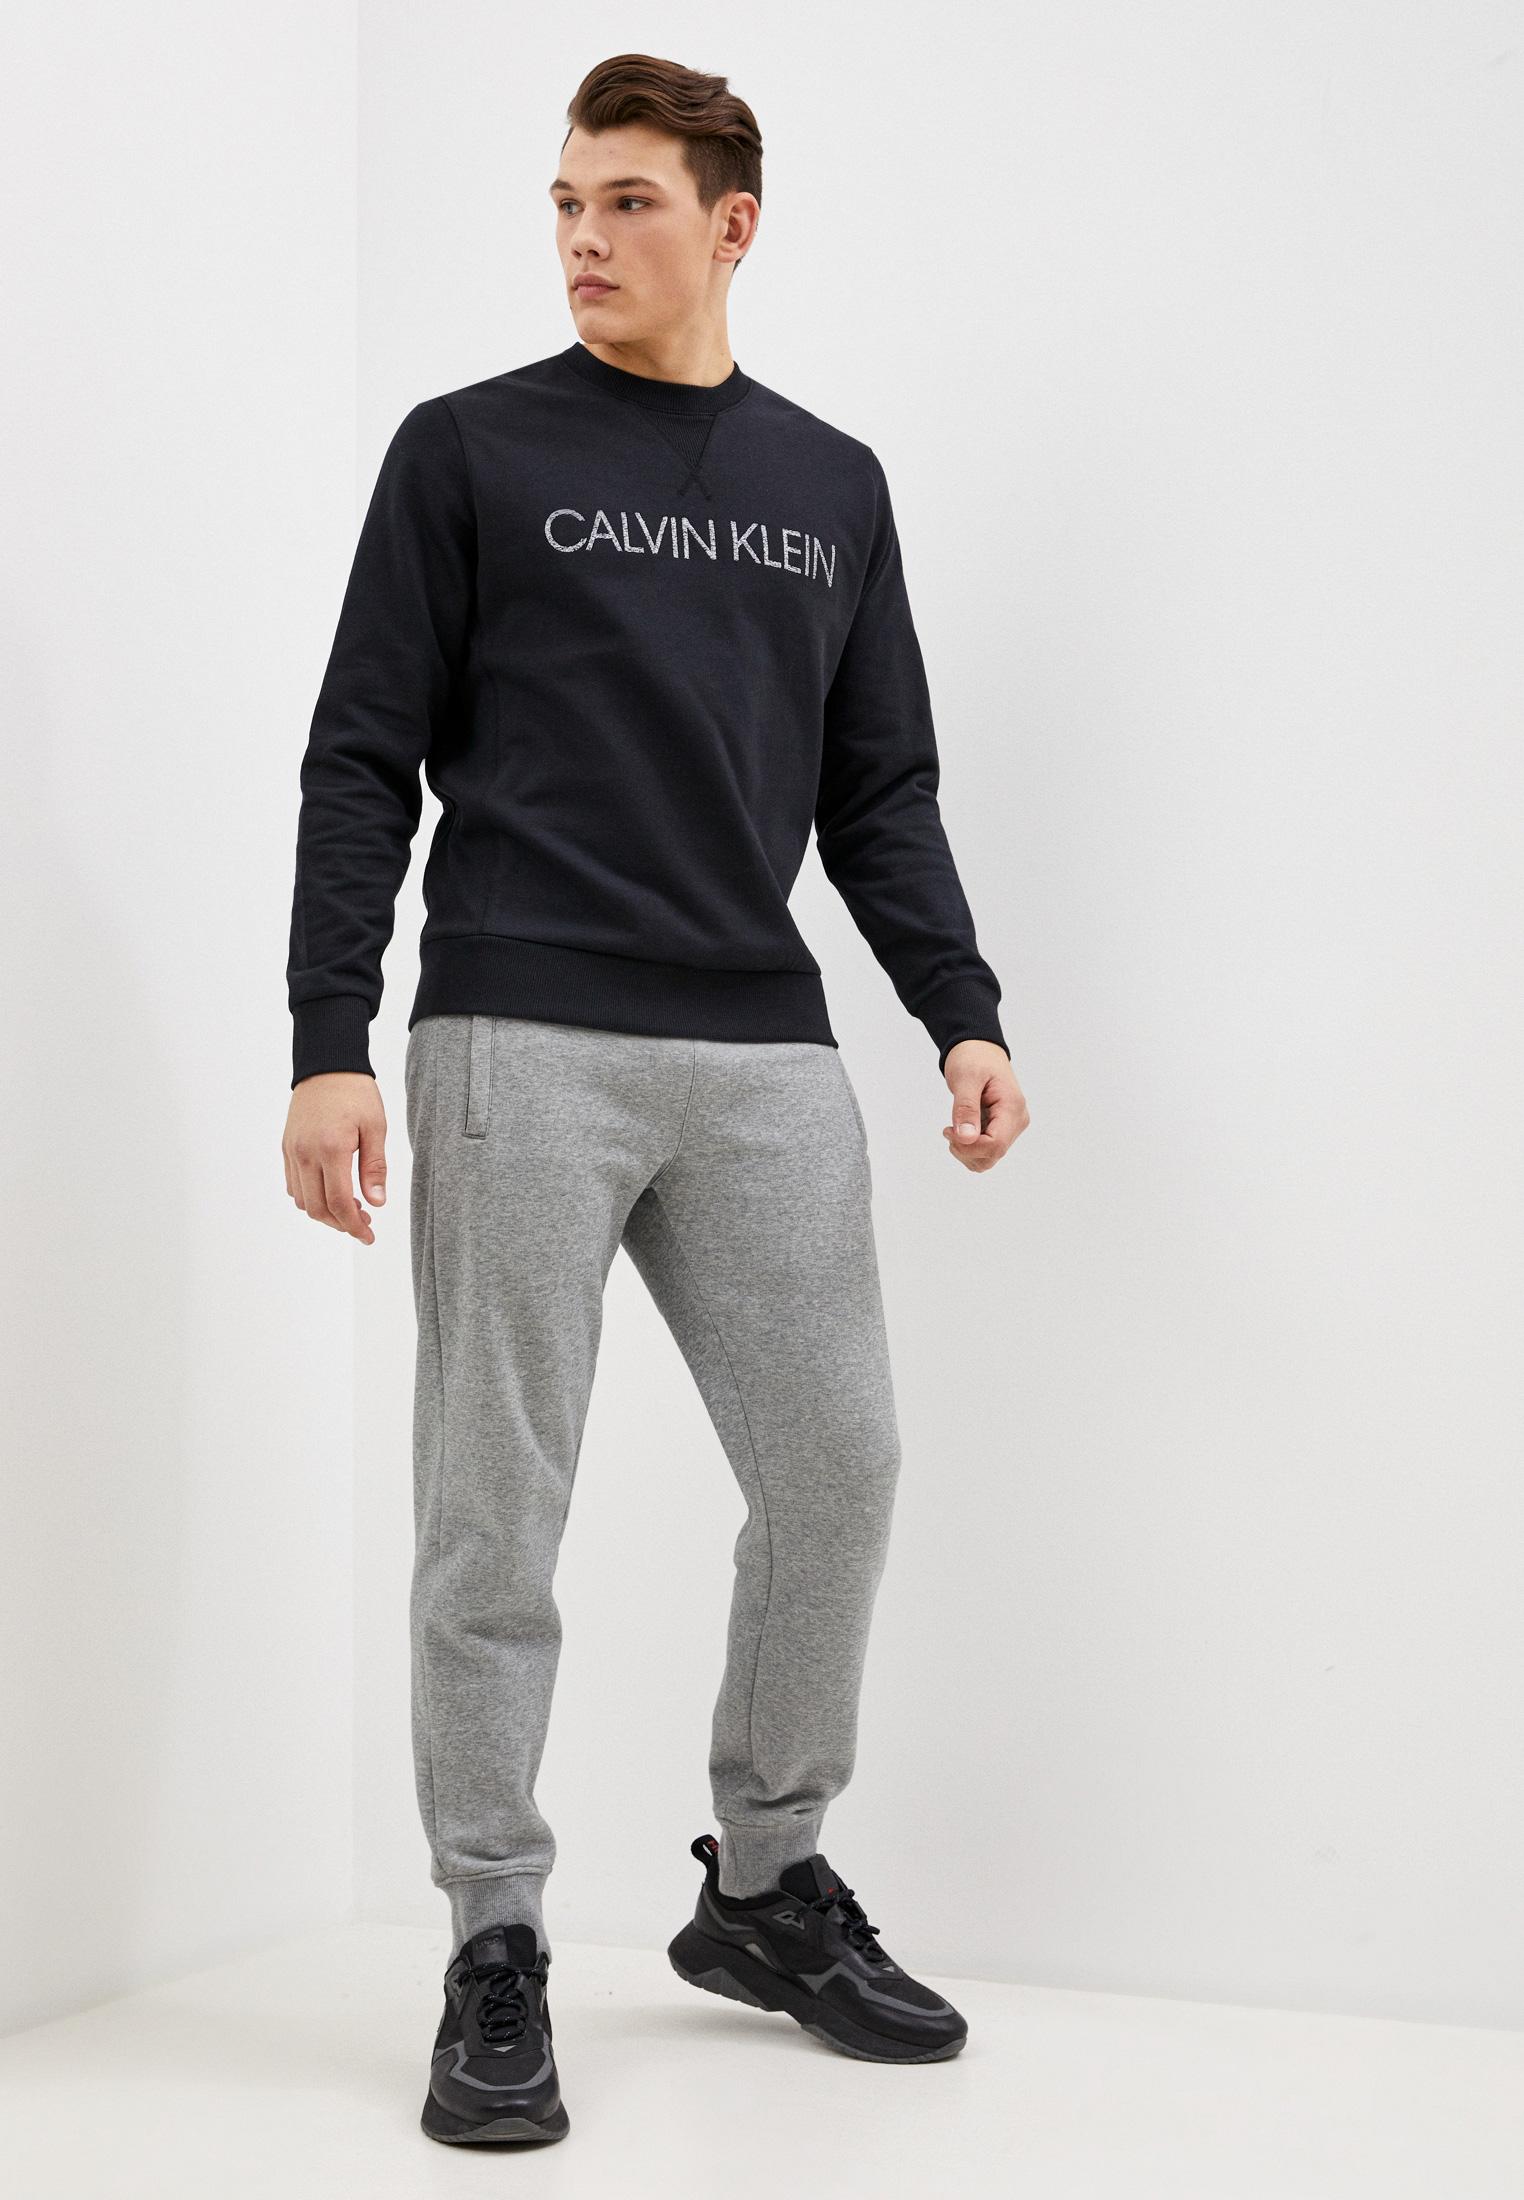 Свитер Calvin Klein (Кельвин Кляйн) k10k105719: изображение 3